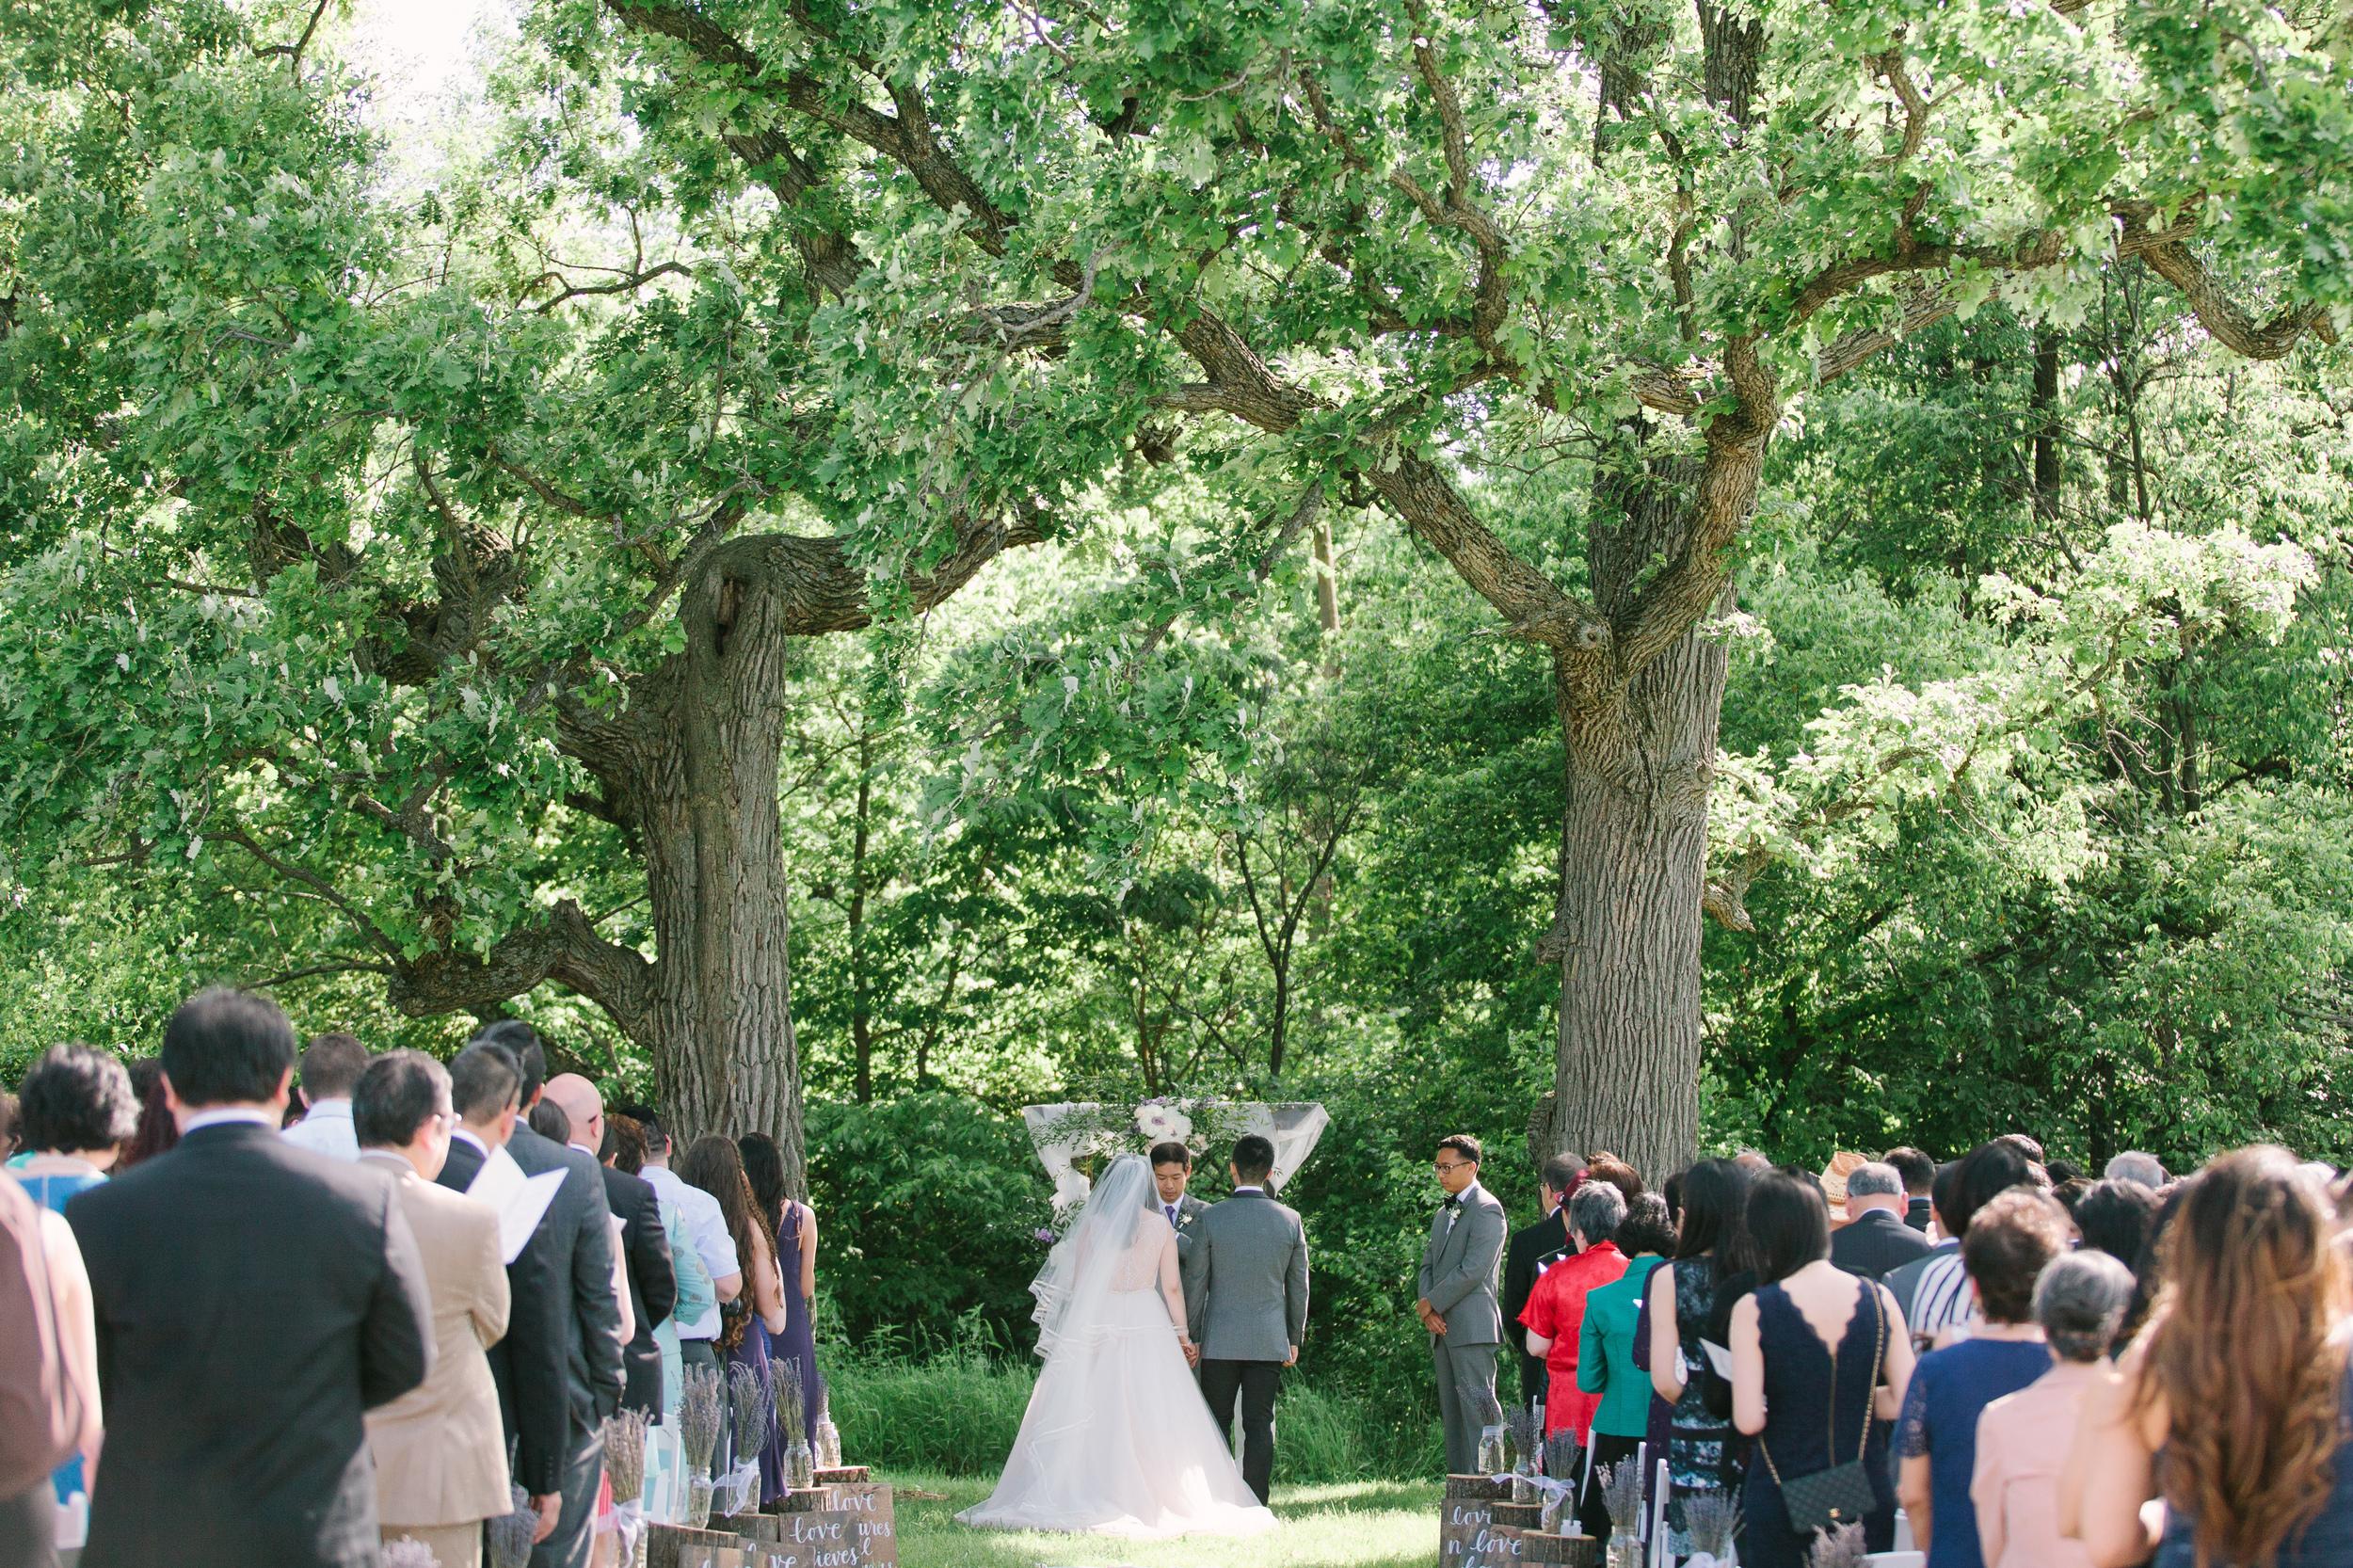 Nicodem Creative_Blog_Leung Wedding_The Pavilion at Orchad Ridge Farms_Rockton Illinois-31.jpg